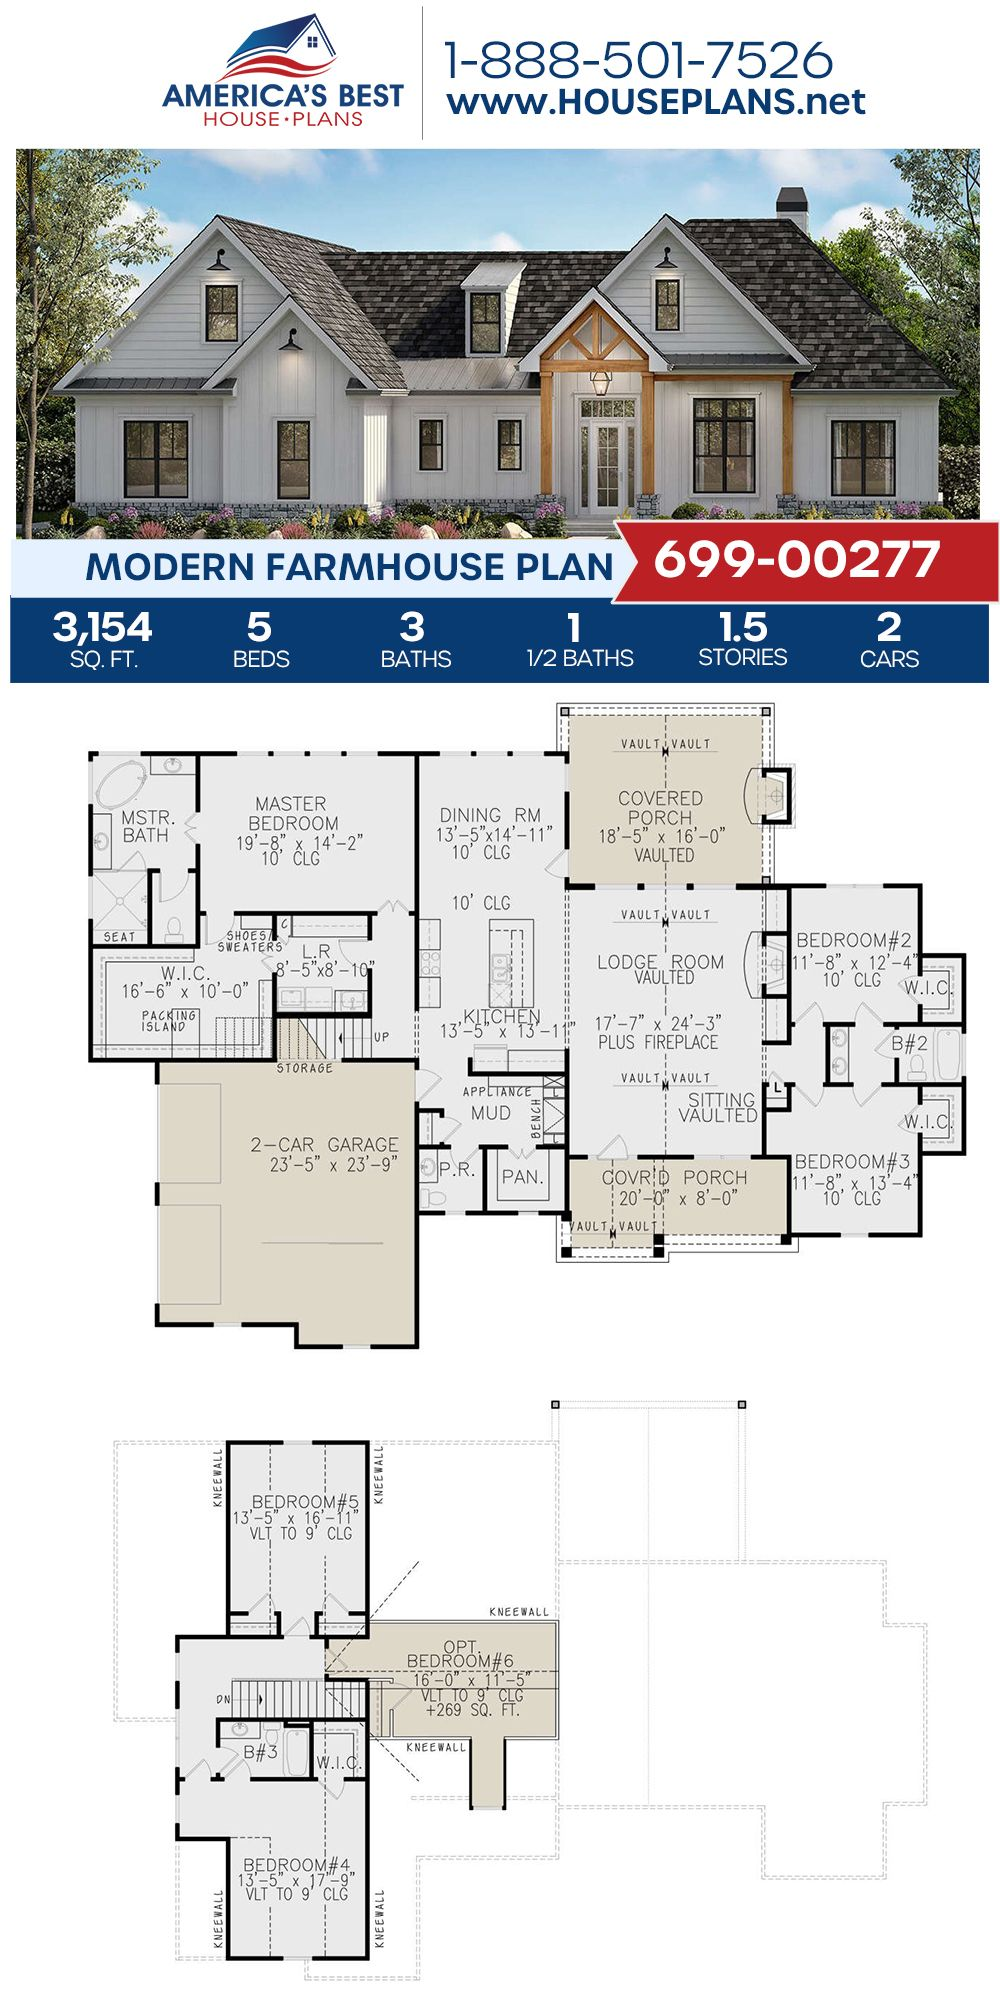 House Plan 699 00277 Modern Farmhouse Plan 3 154 Square Feet 5 Bedrooms 3 5 Bathrooms Modern Farmhouse Plans Farmhouse Plans House Plans Farmhouse